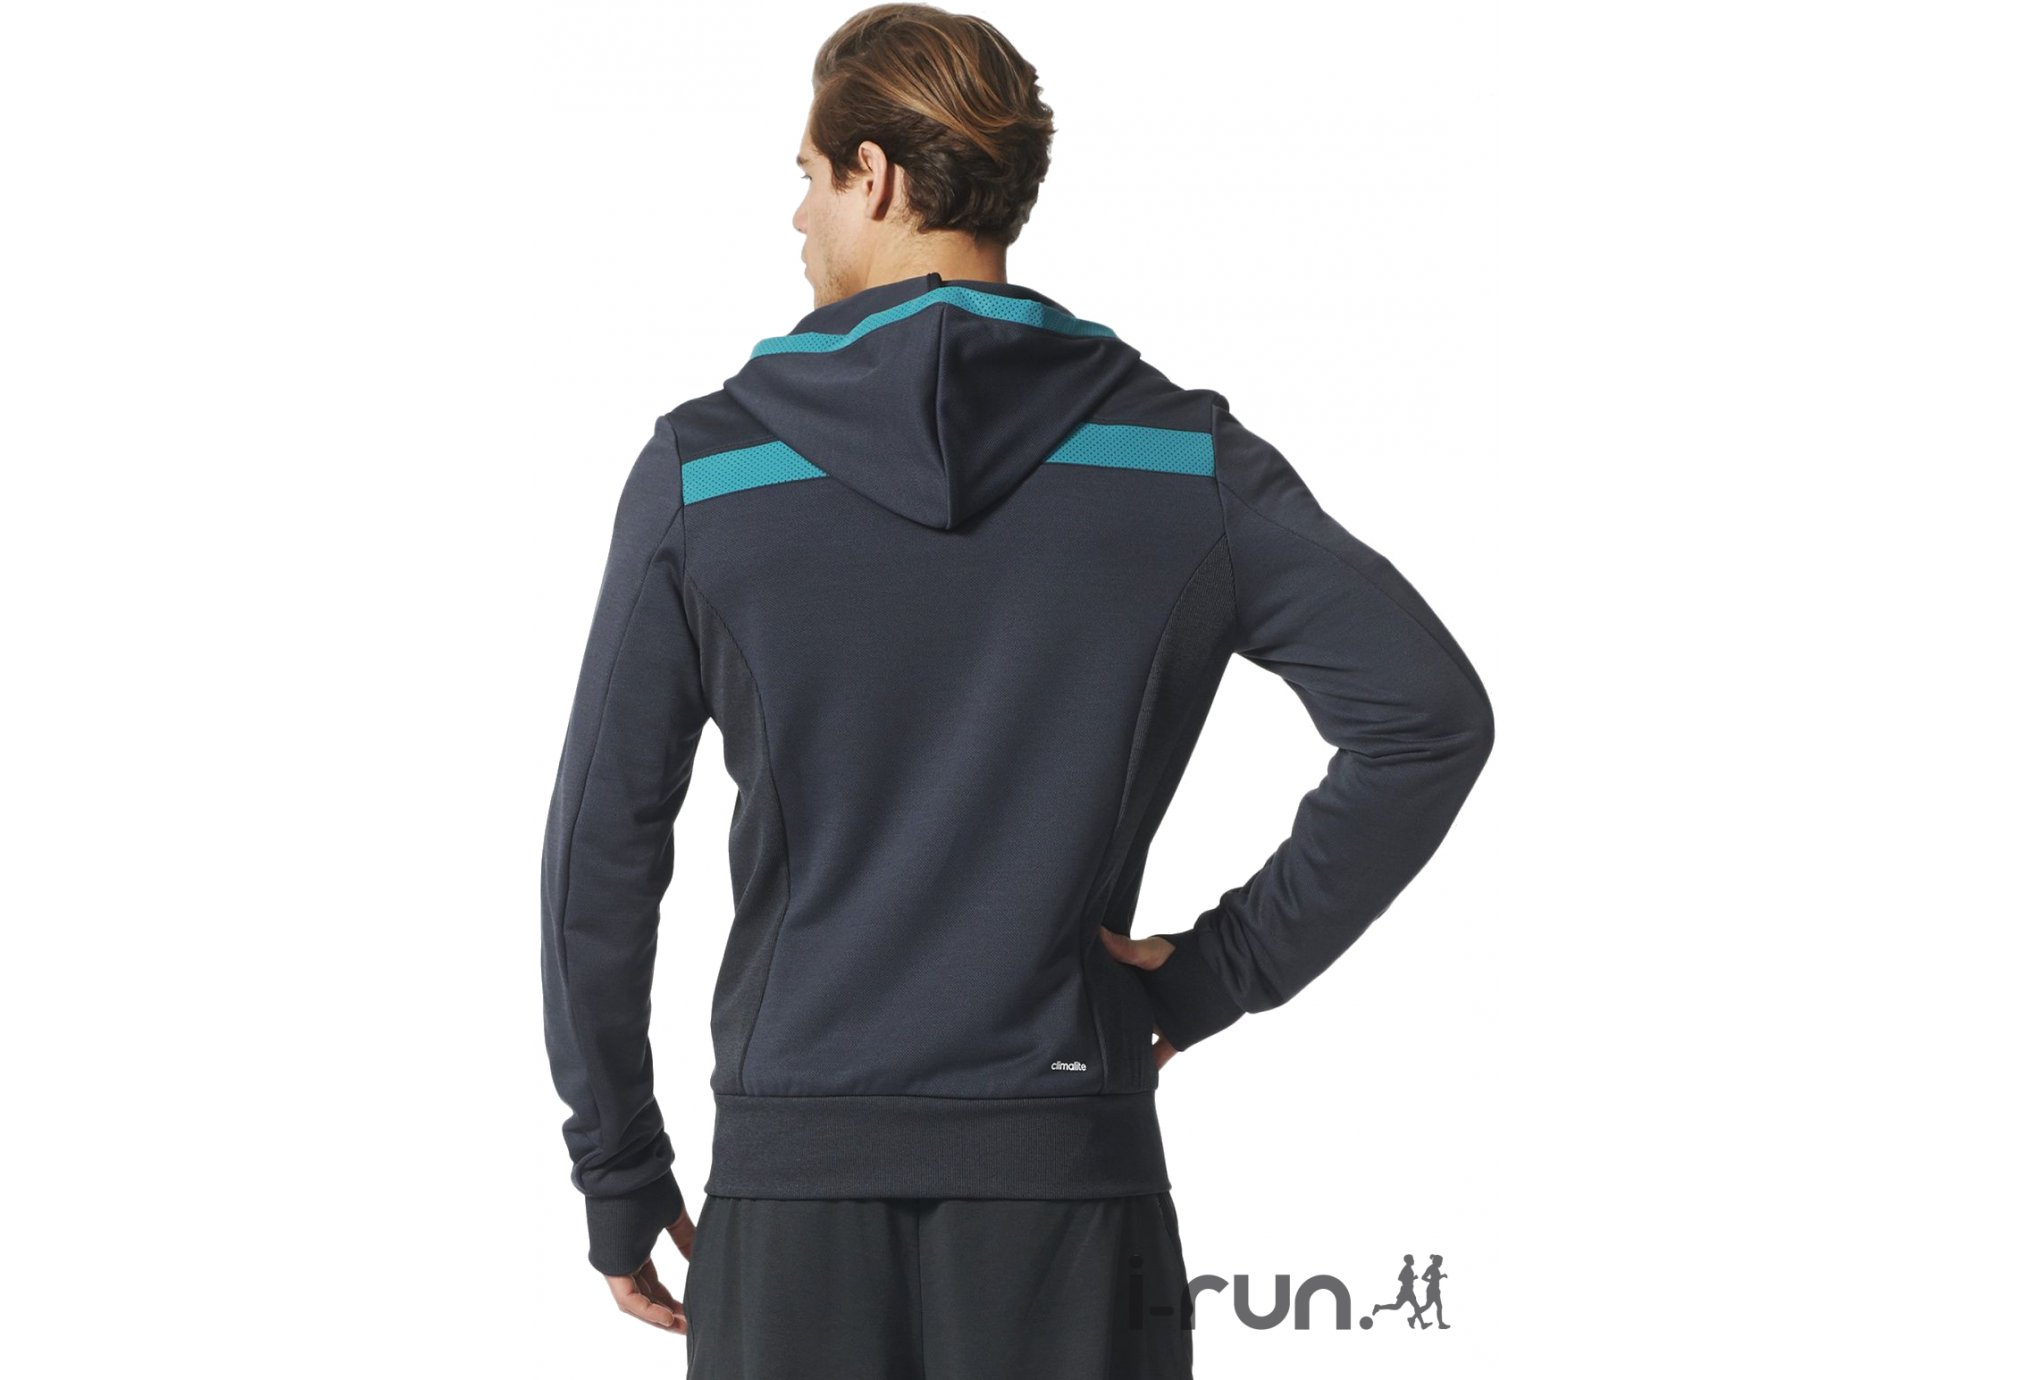 3149a3eedde adidas-veste-beyond-the-run-m-vetements-homme-141687-1-sz.jpg